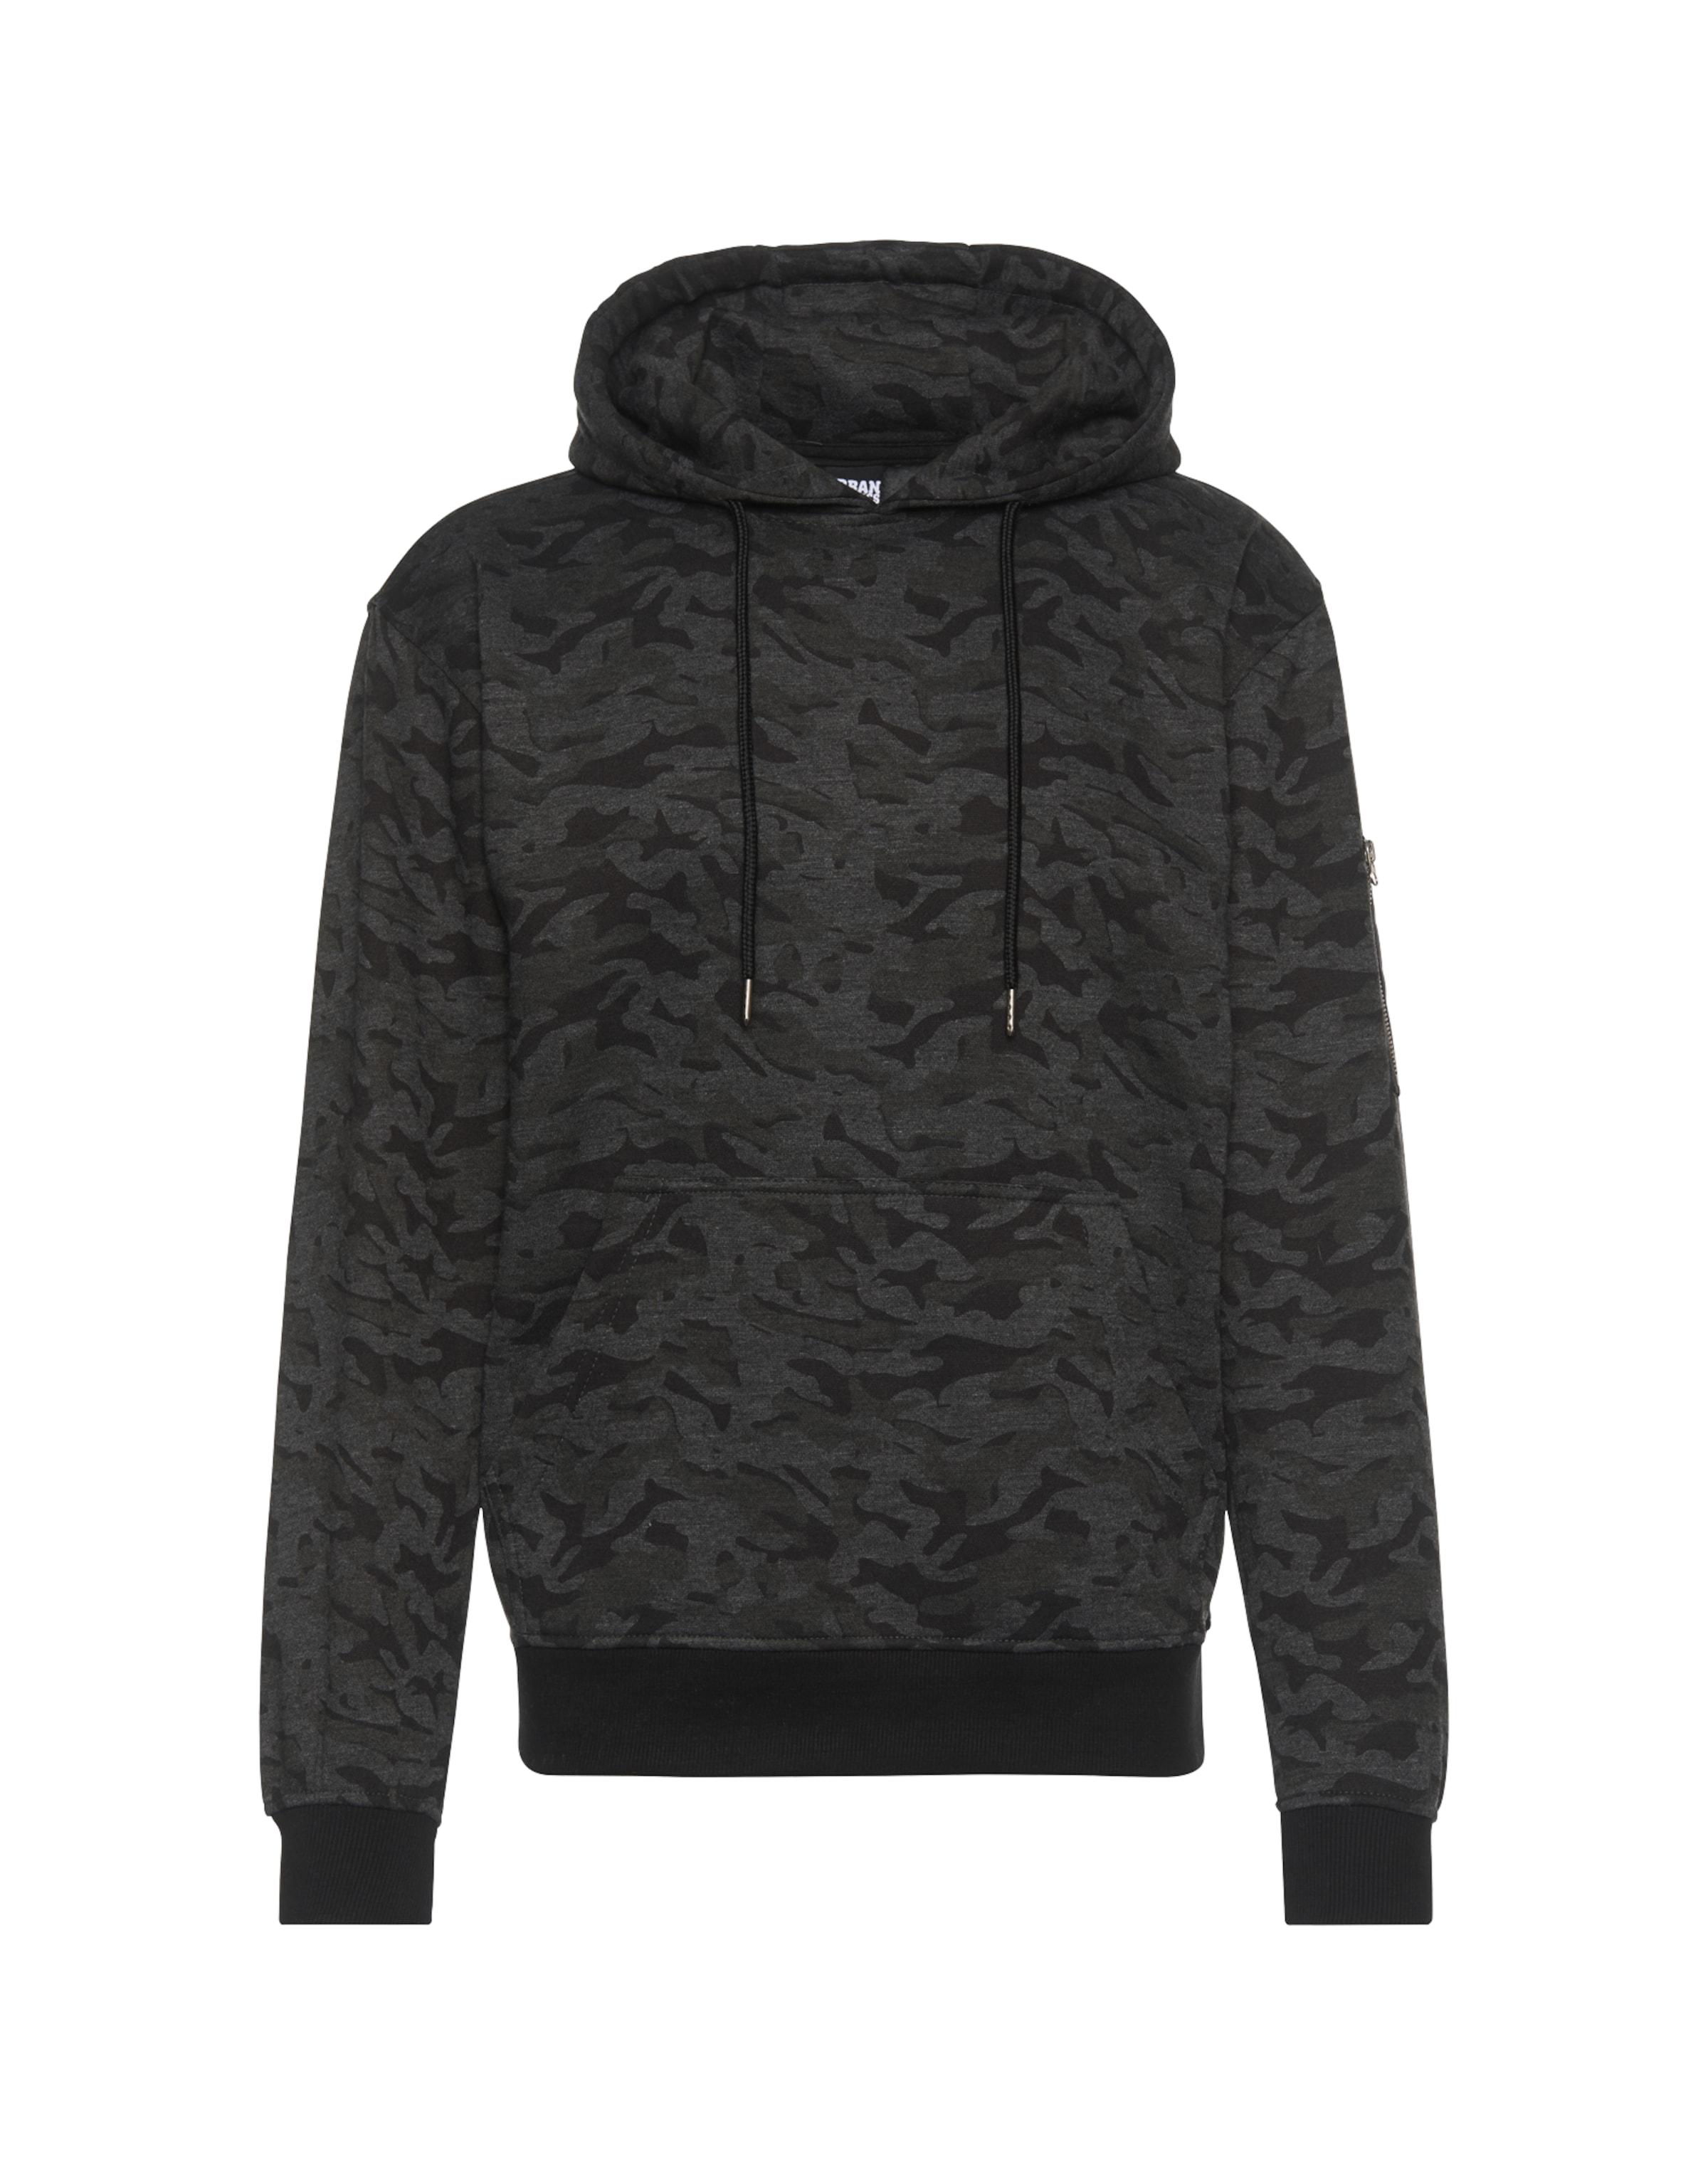 'sweat Classics Sweatshirt DunkelgrauSchwarz Camo Bomber Hoody' Urban In H2eIYE9WD